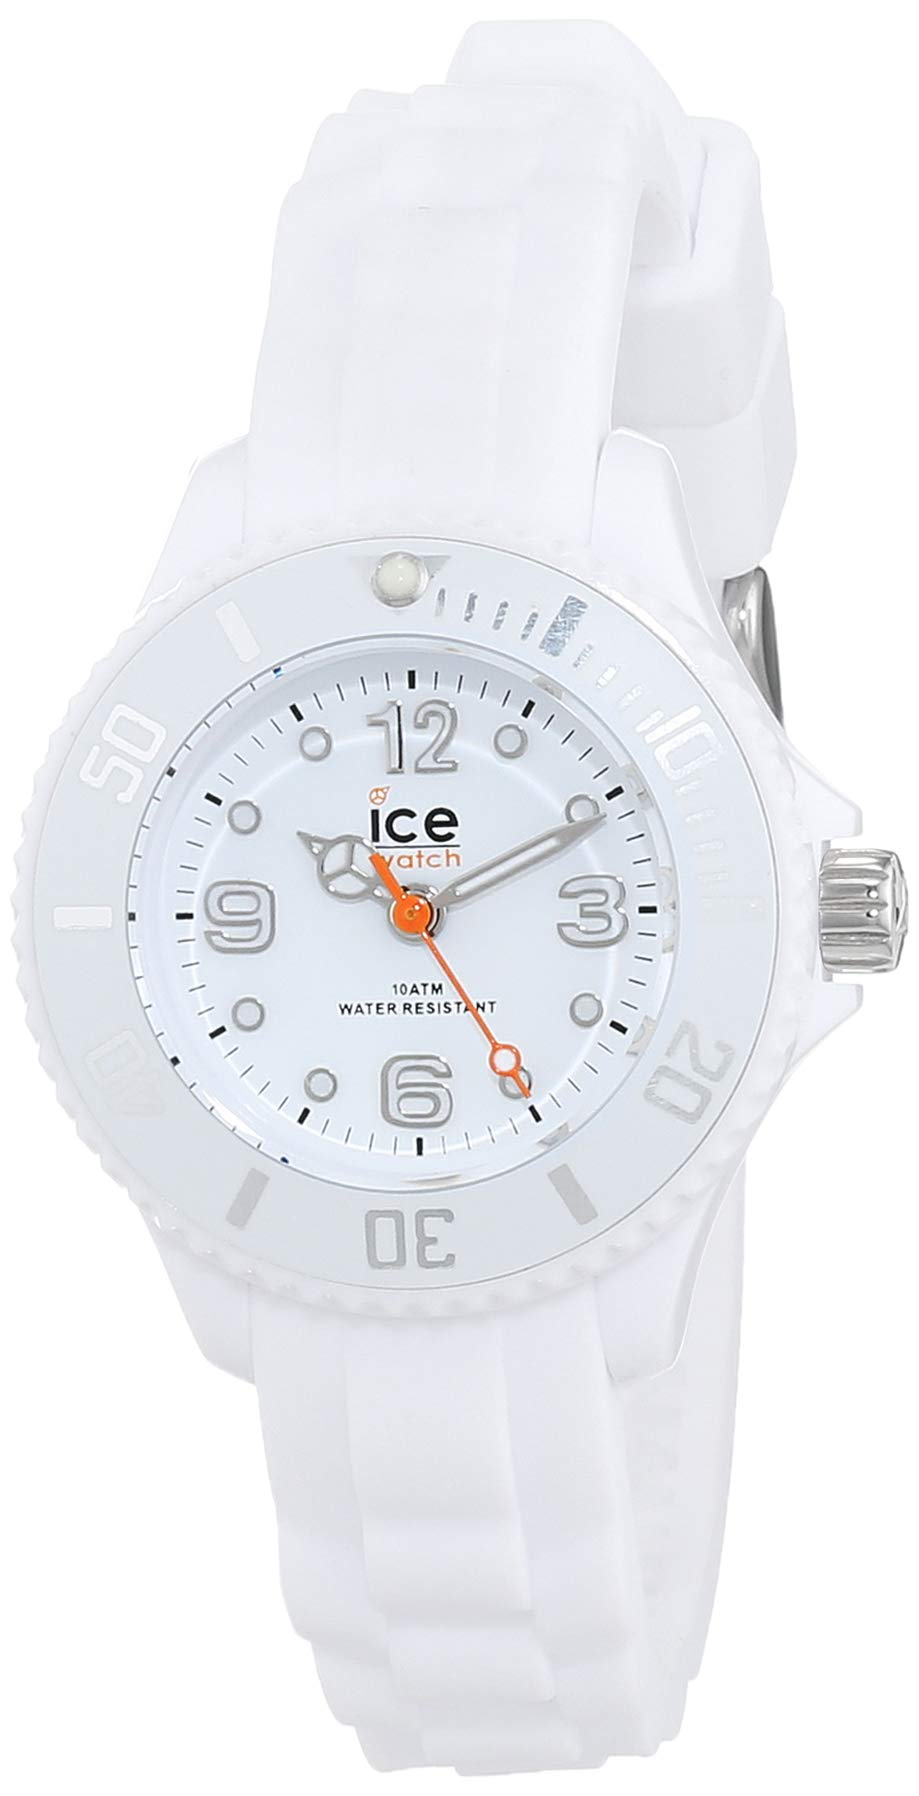 Ice-Watch - ICE forever White - Weiße Herrenuhr mit Silikonarmband 10